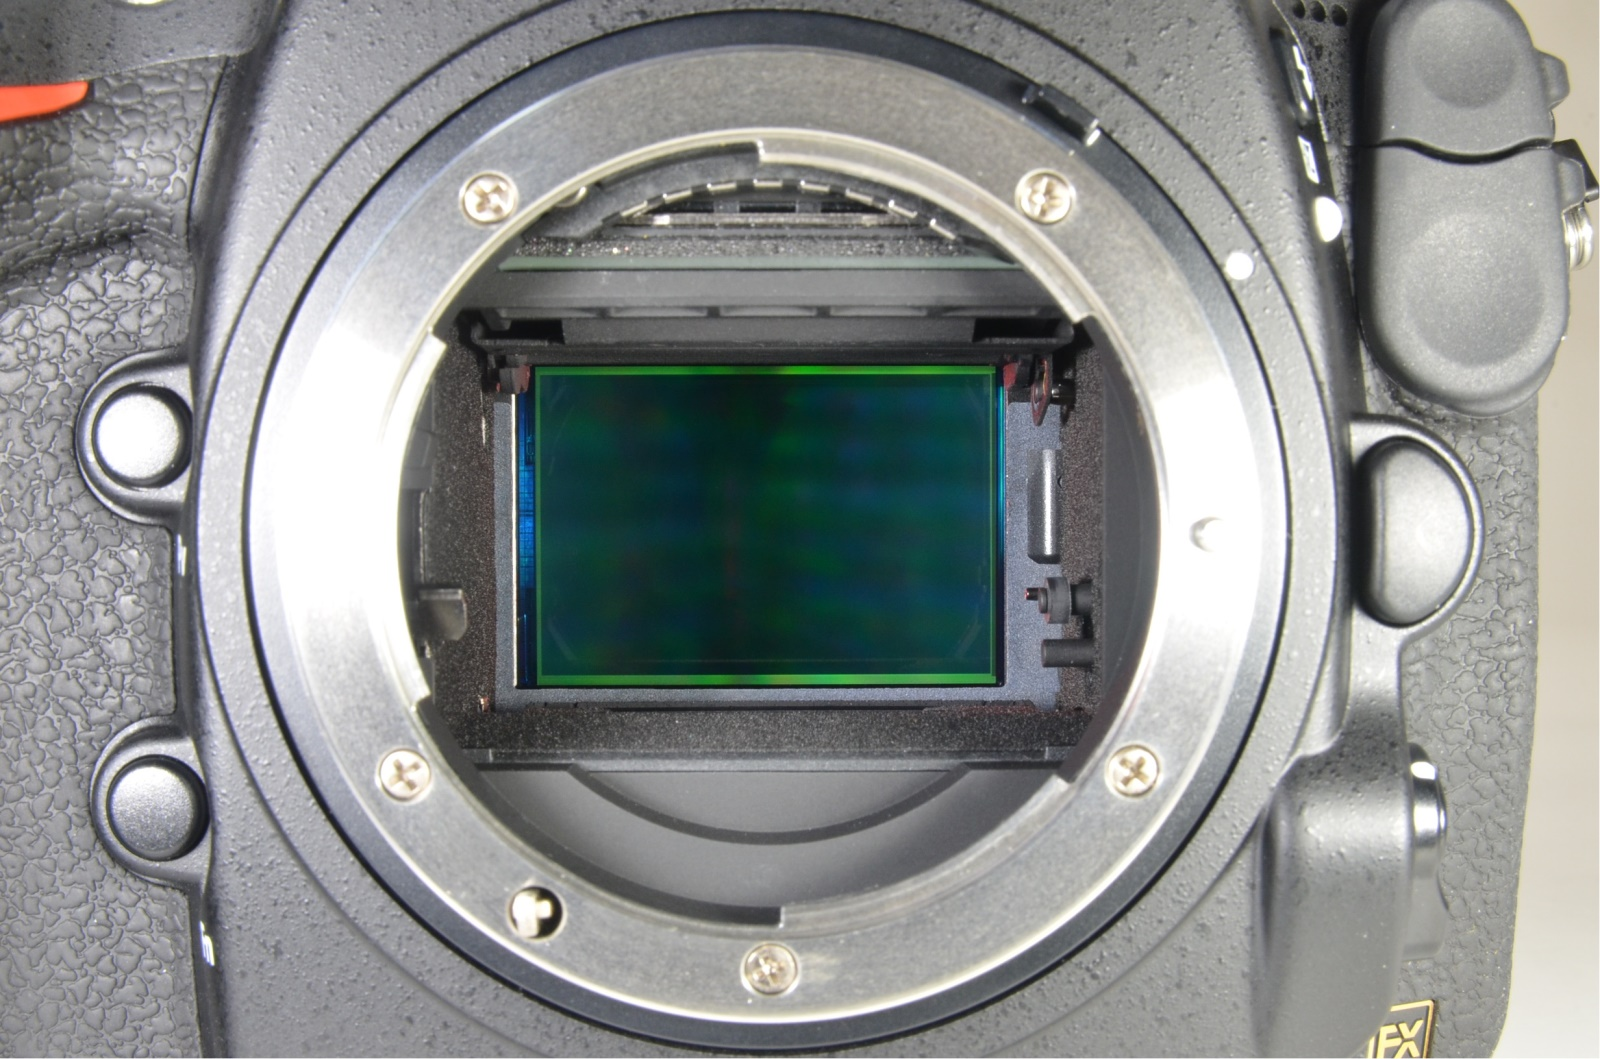 nikon d810 36.3mp digital slr camera body shutter count 482 from japan